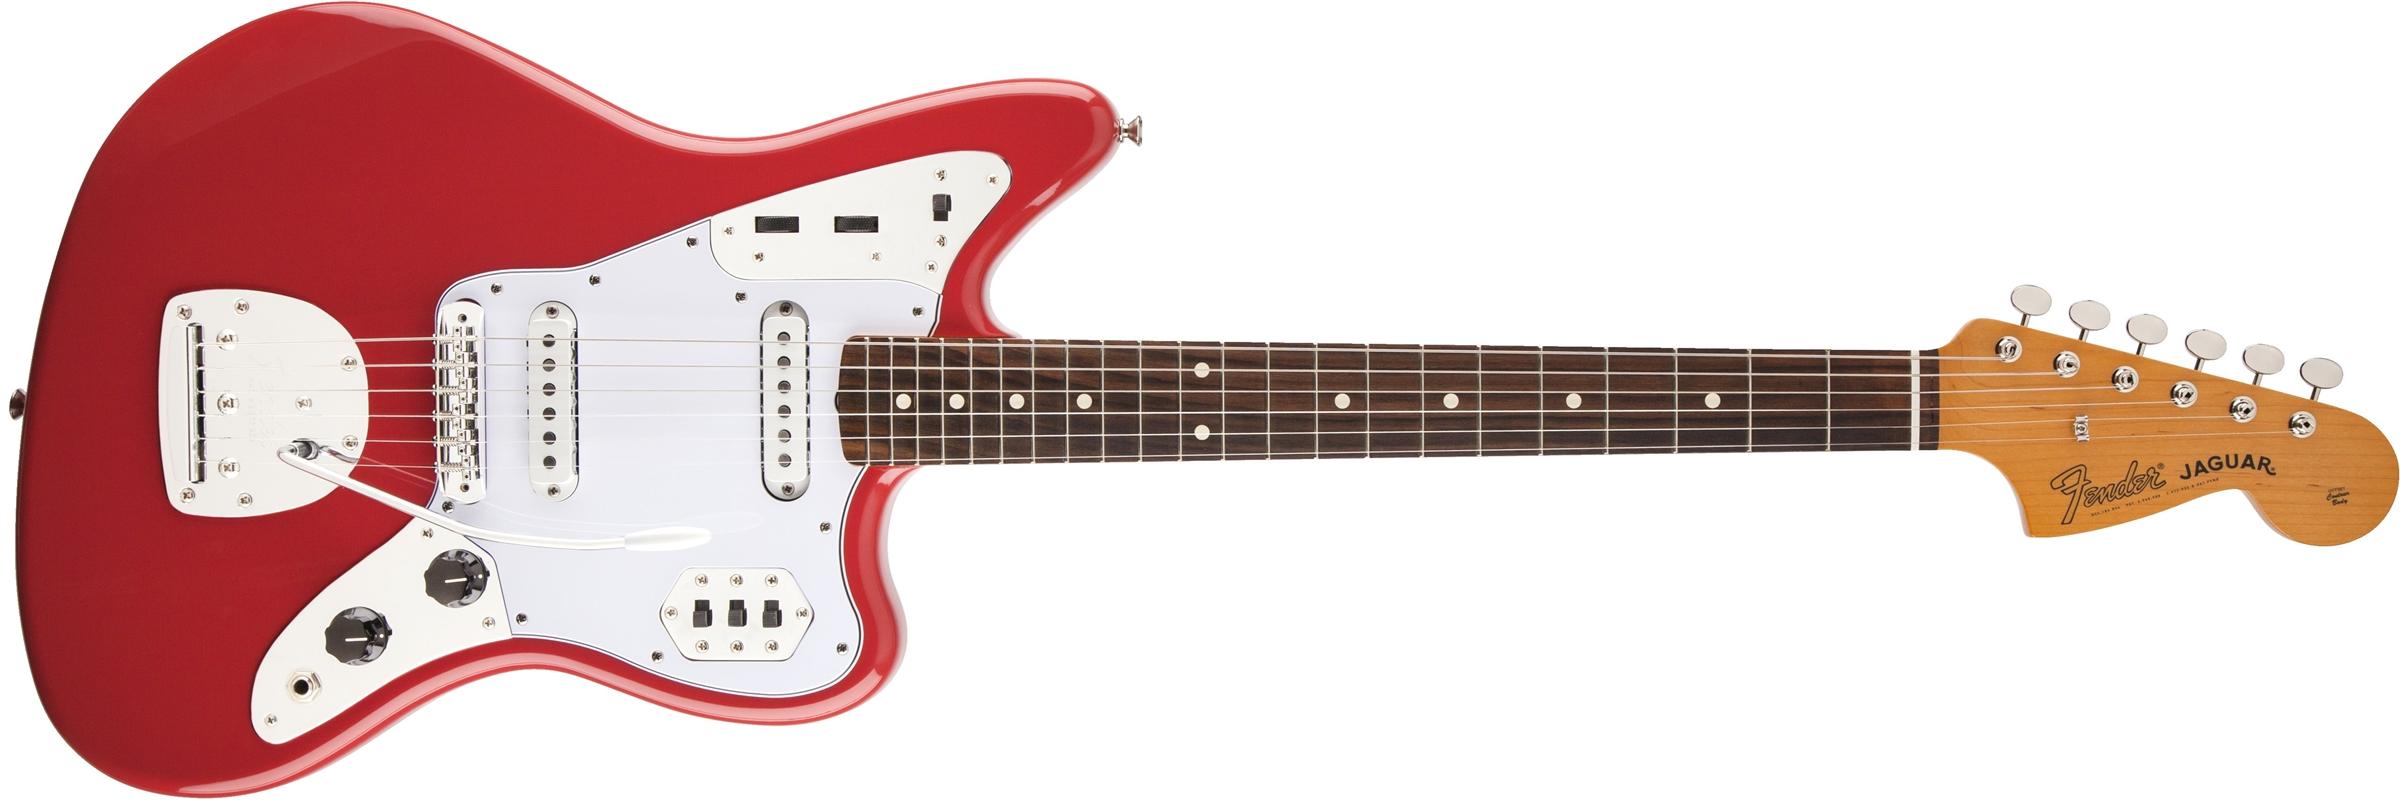 jaguar famous guitar body designs